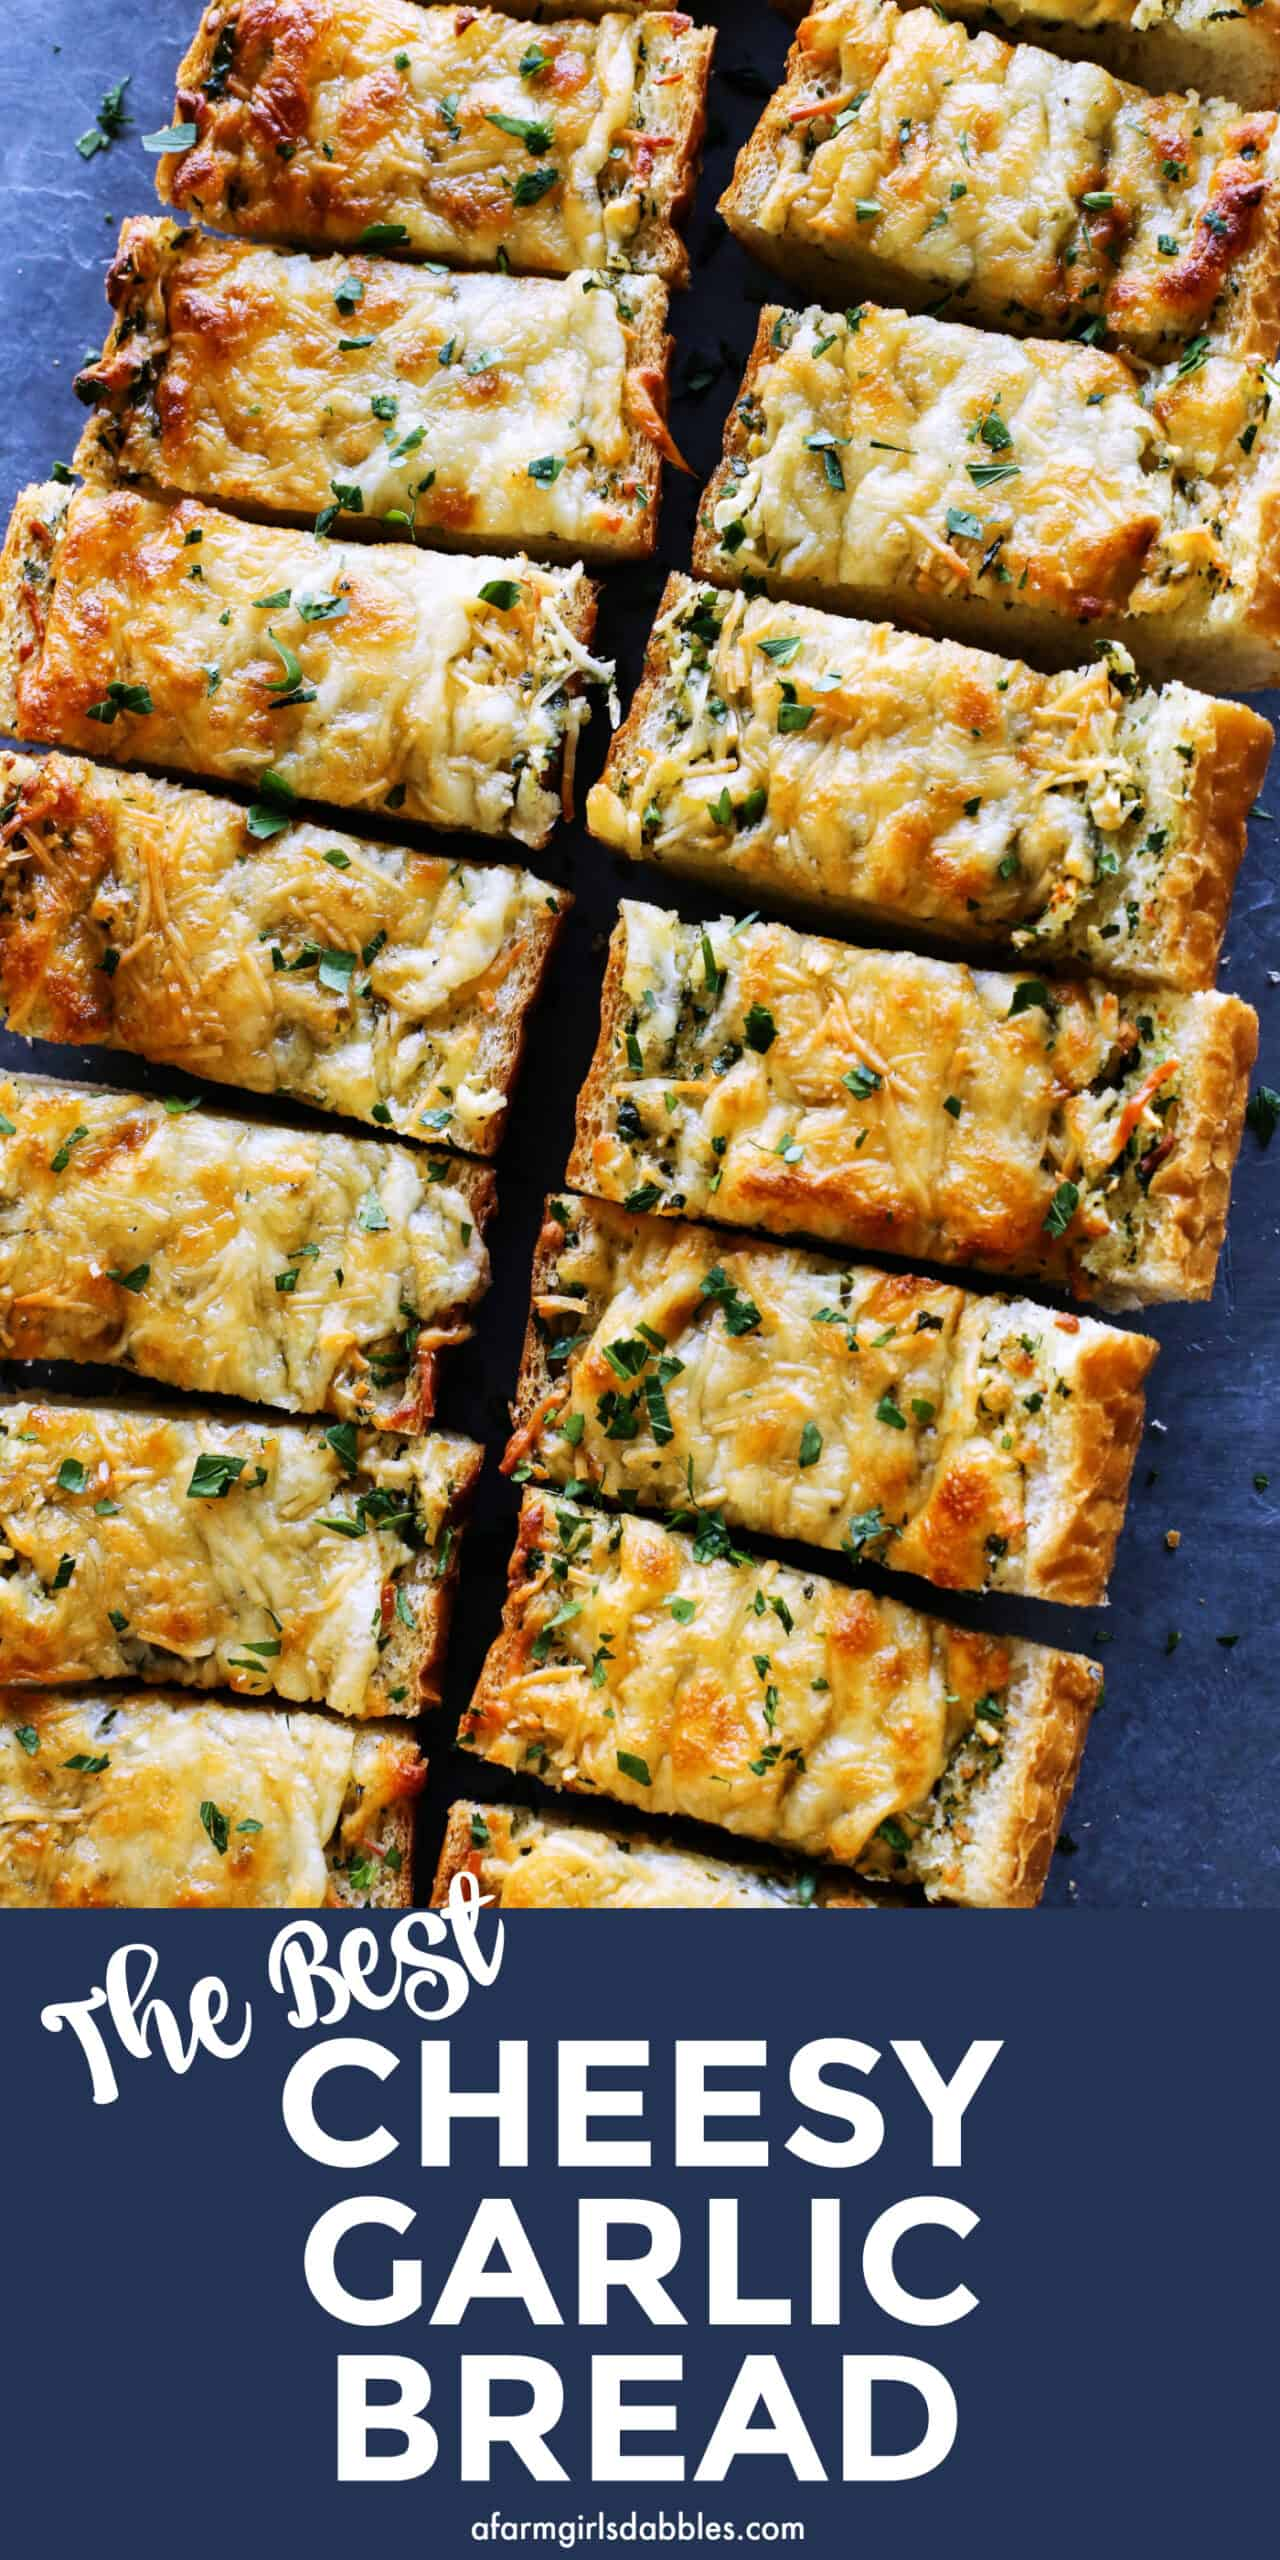 pinterest image of cheesy garlic bread, cut into pieces